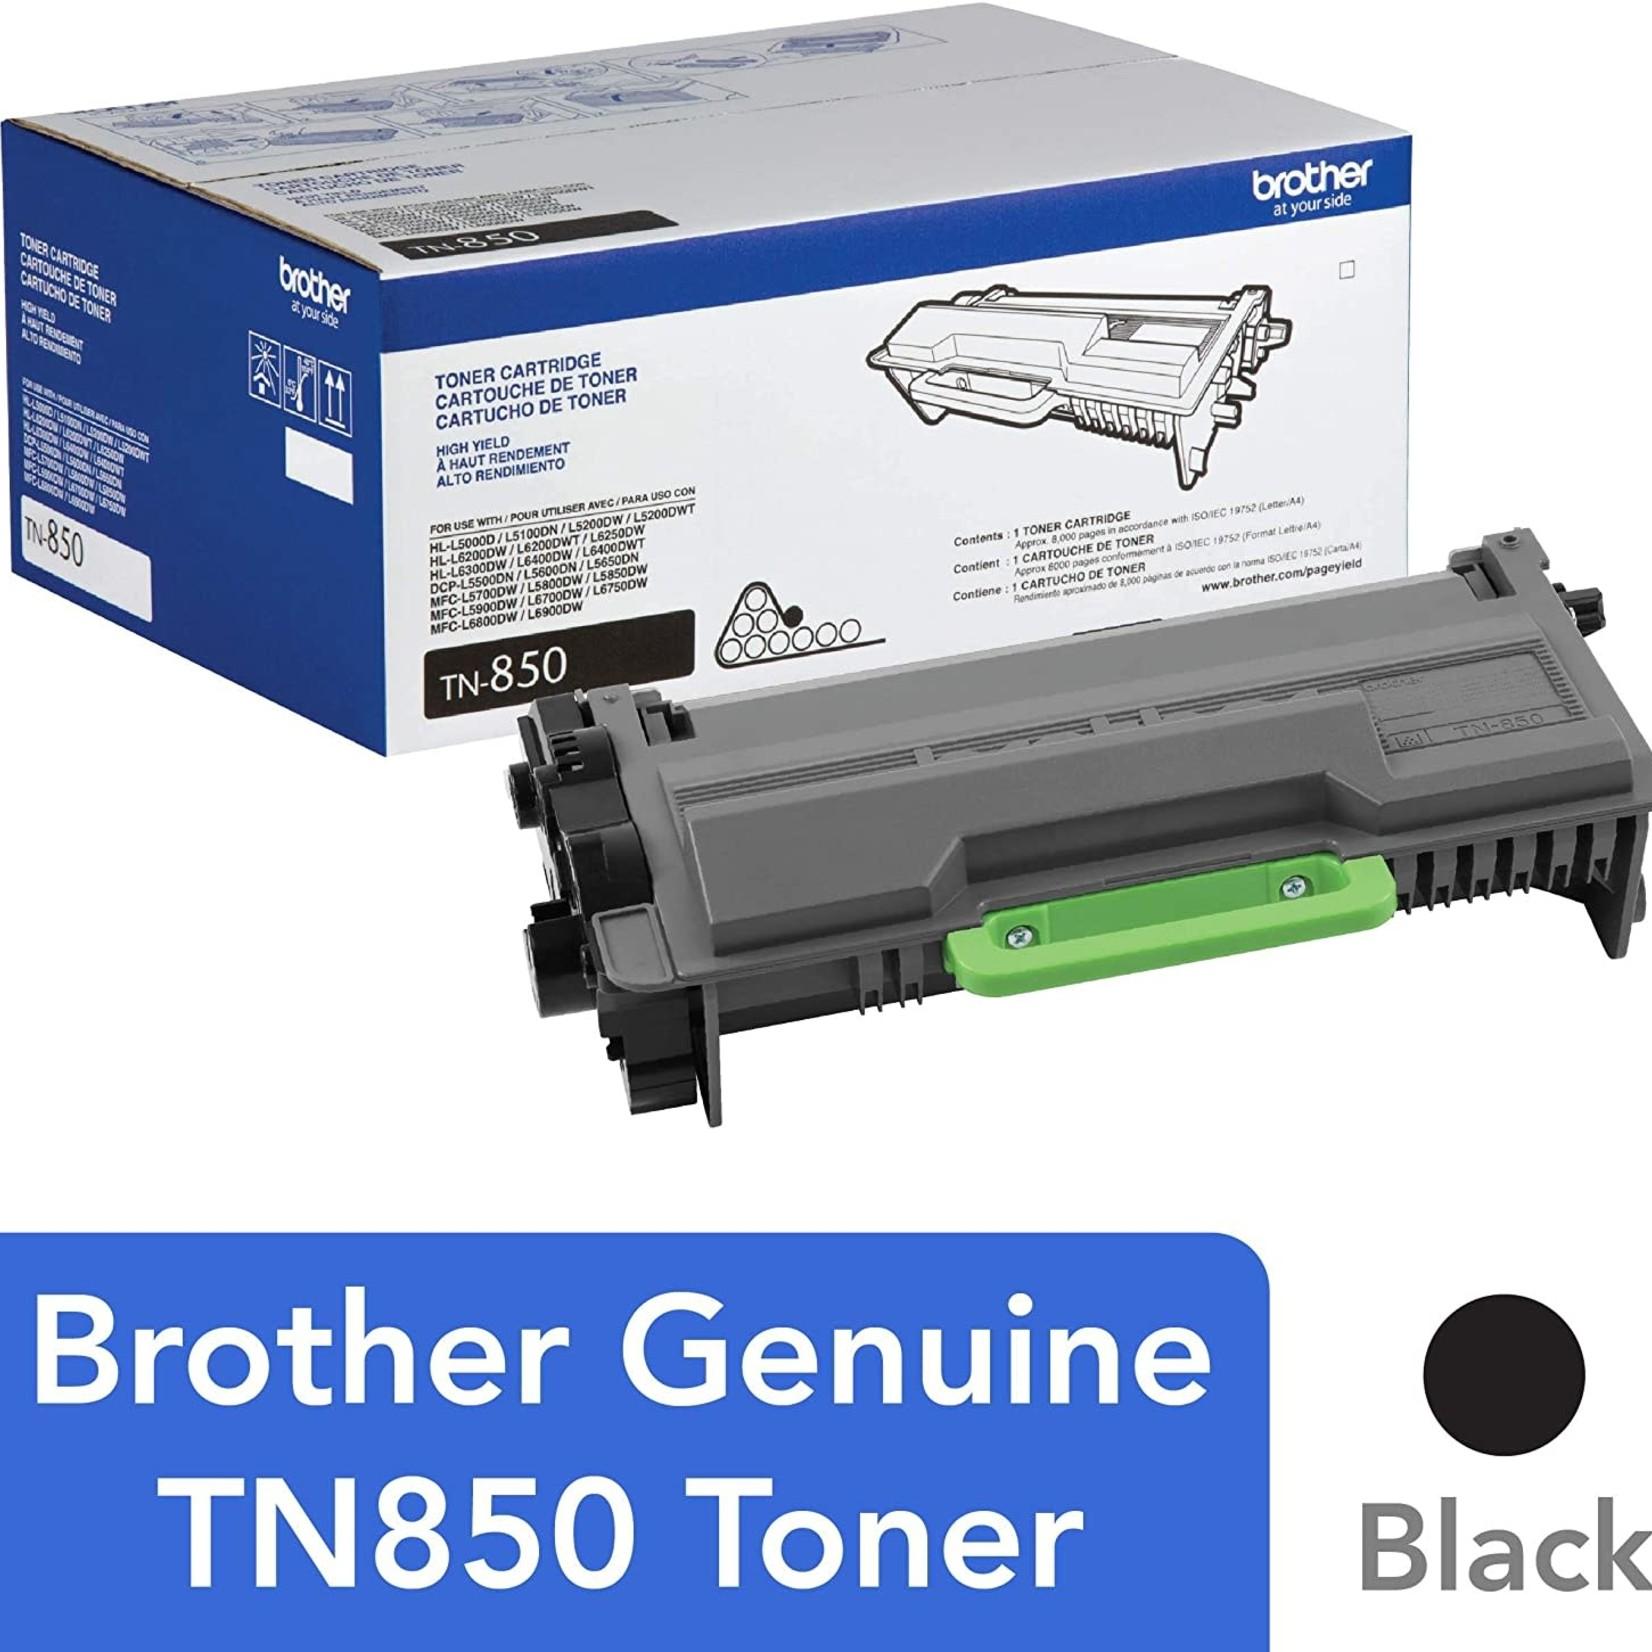 Brother TN-850 High Yield Toner Cartridge